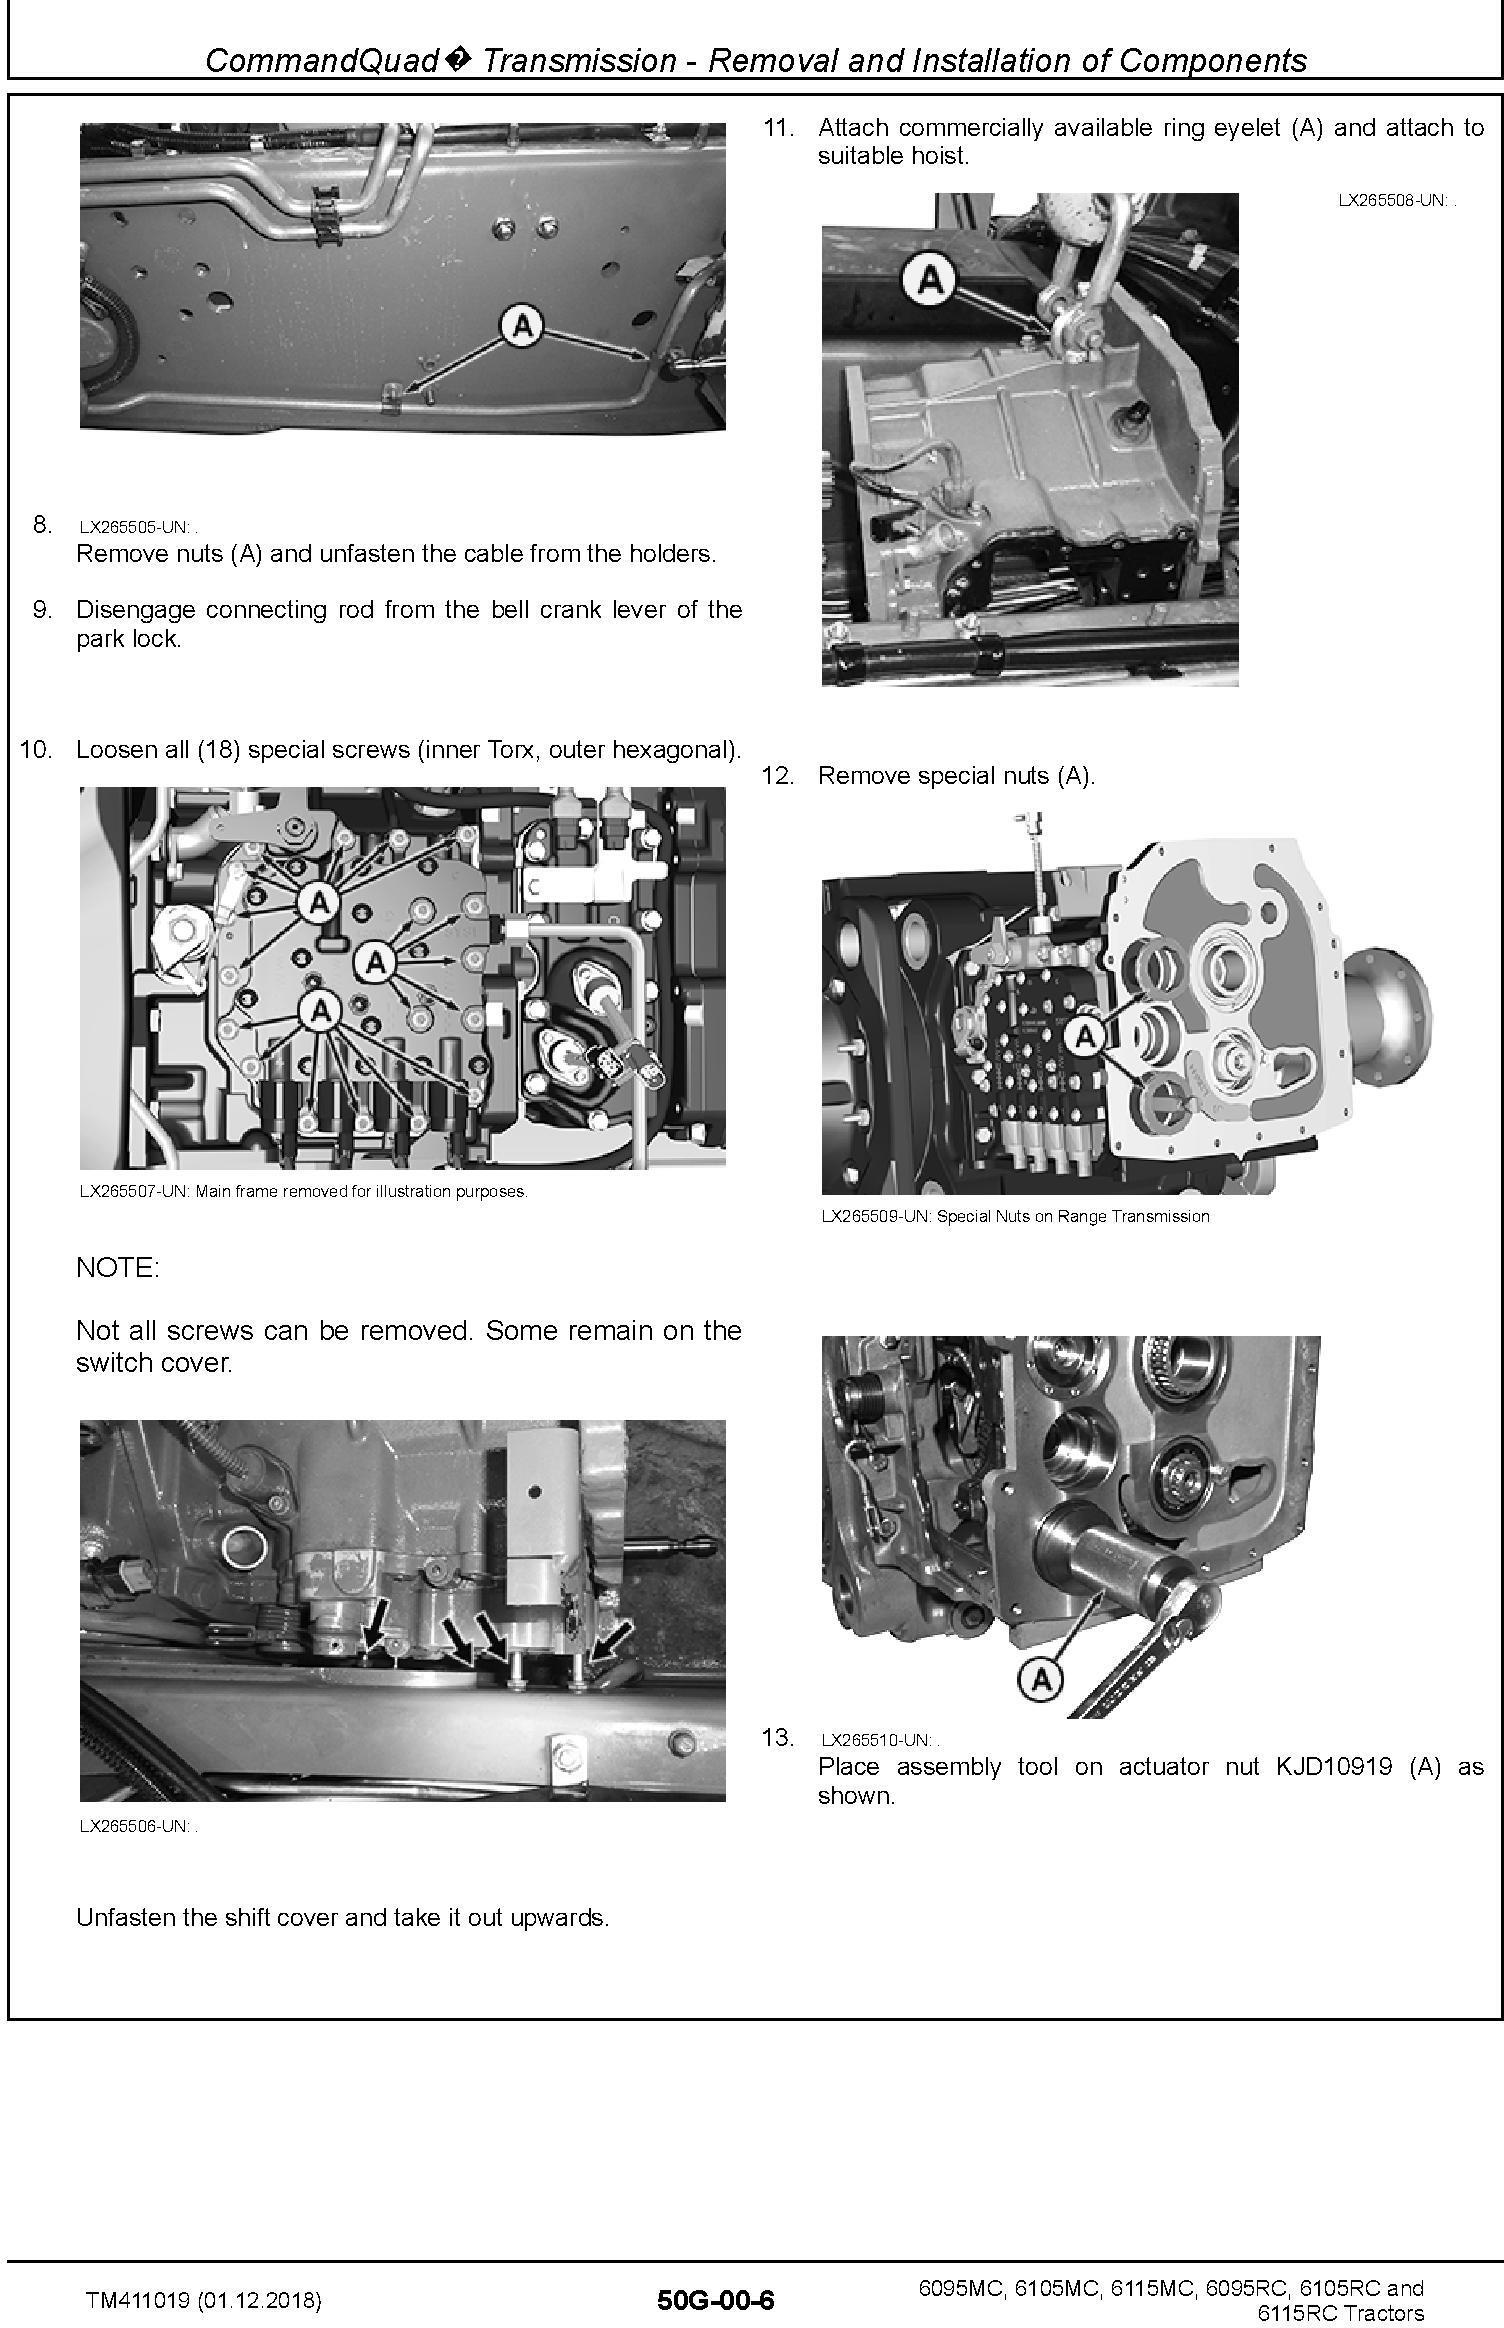 John Deere 6095MC, 6095RC, 6105MC, 6105RC, 6115MC, 6115RC Tractor Repair Technical Manual (TM411019) - 2